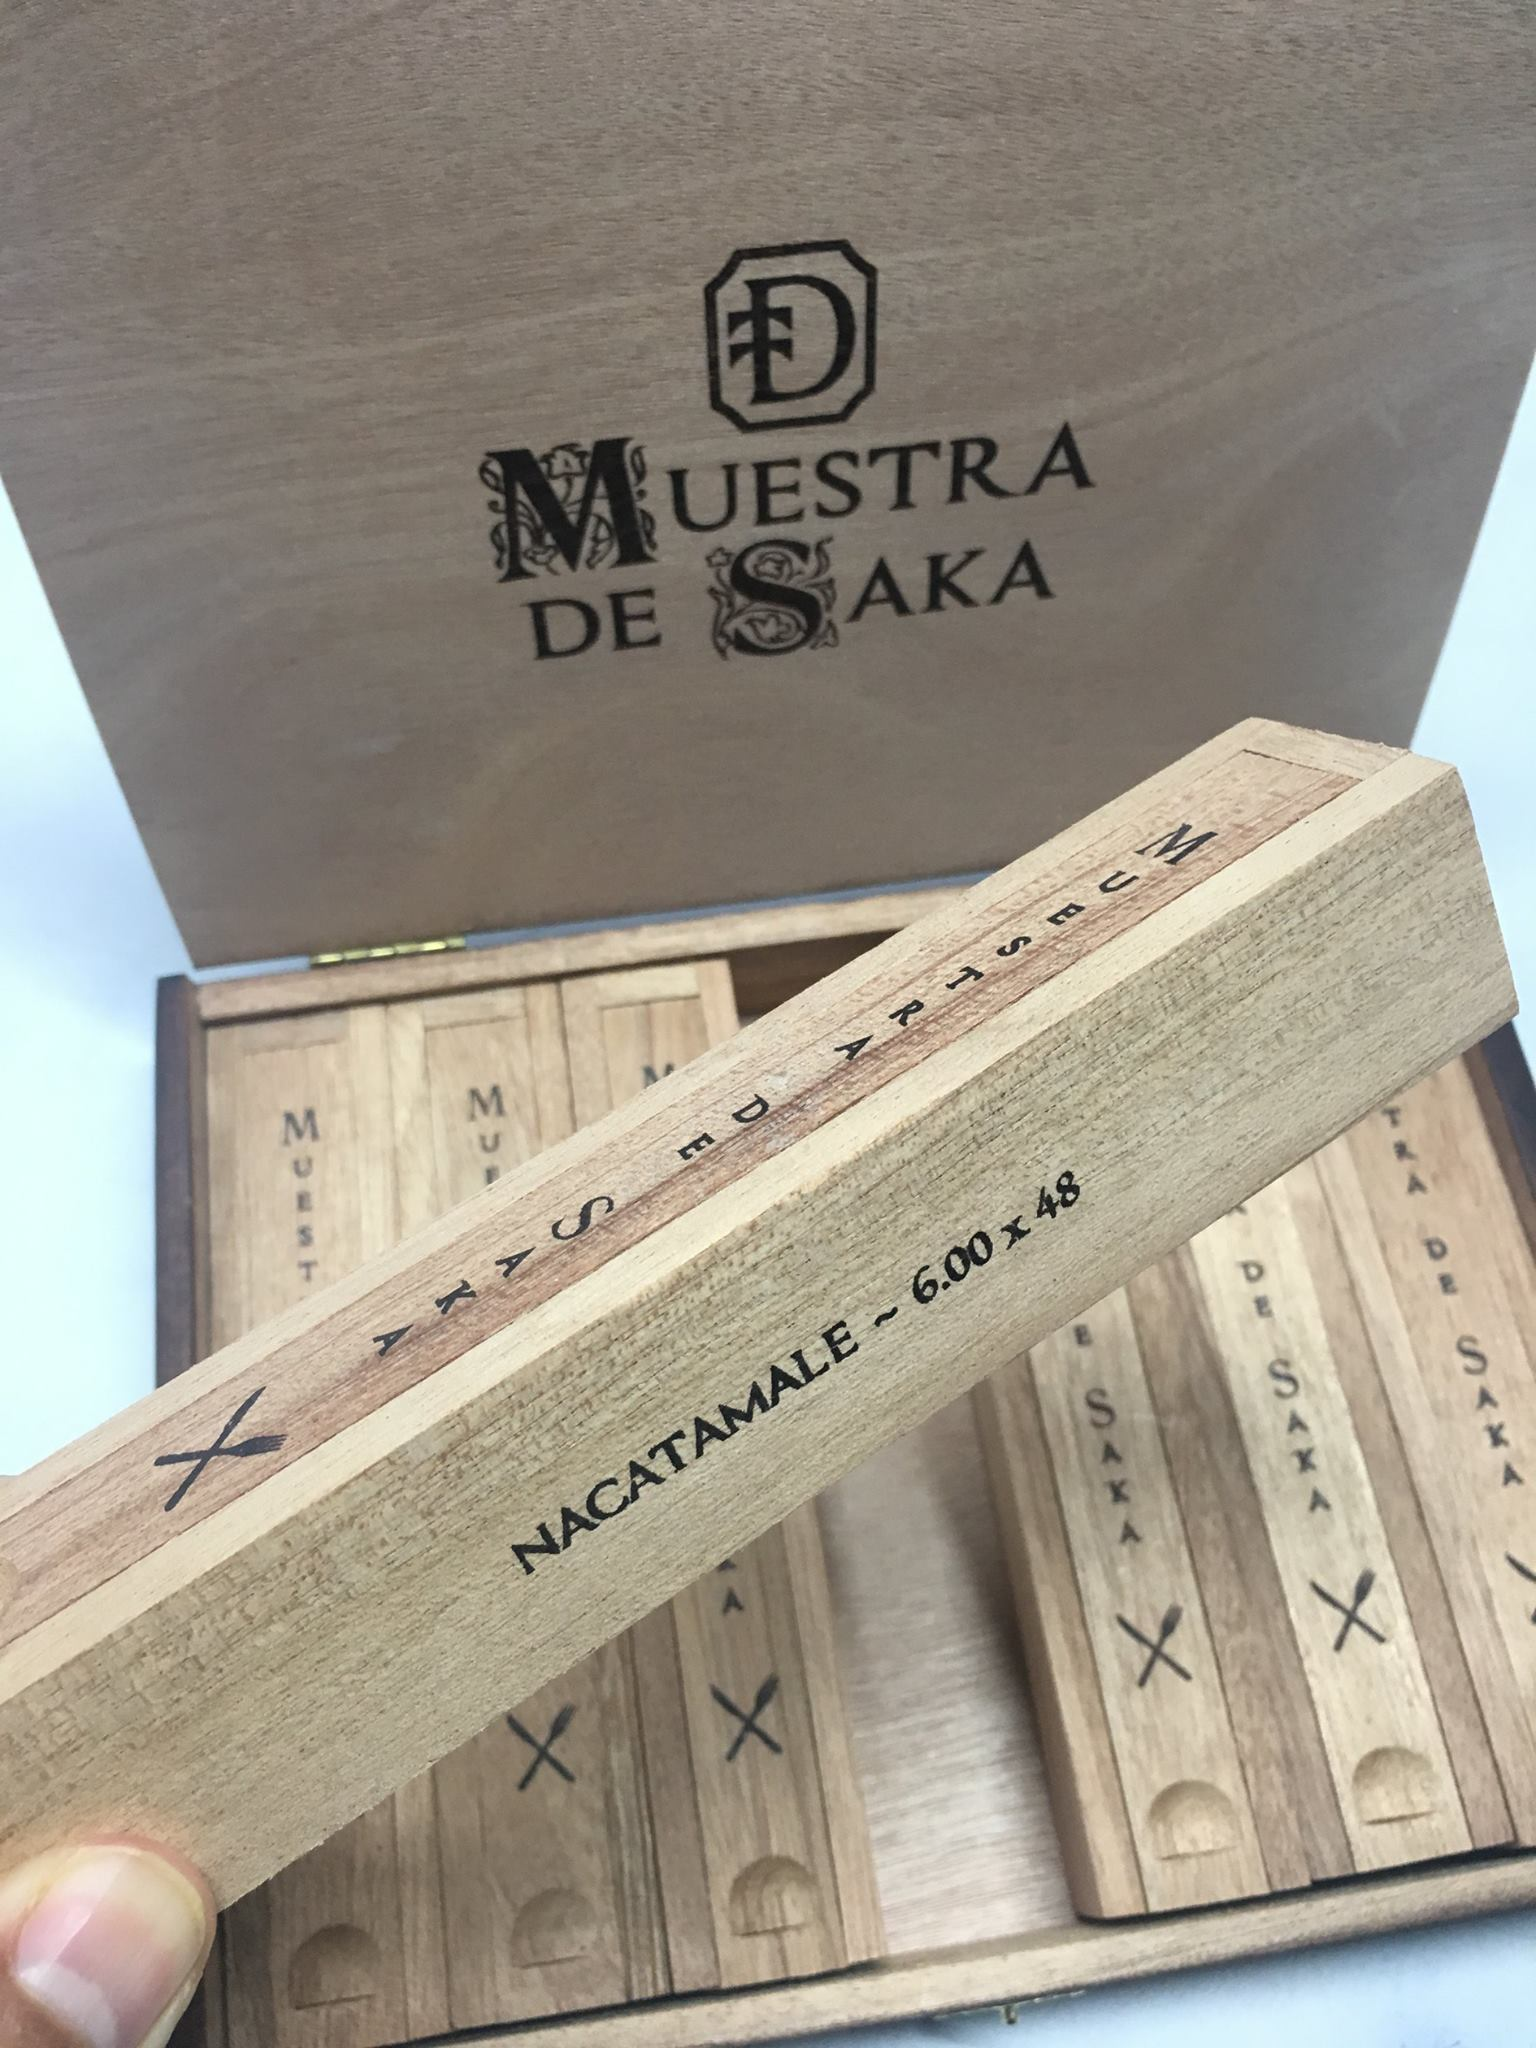 Dunbarton Tobacco & Trust Muestra de Saka Nacatamale